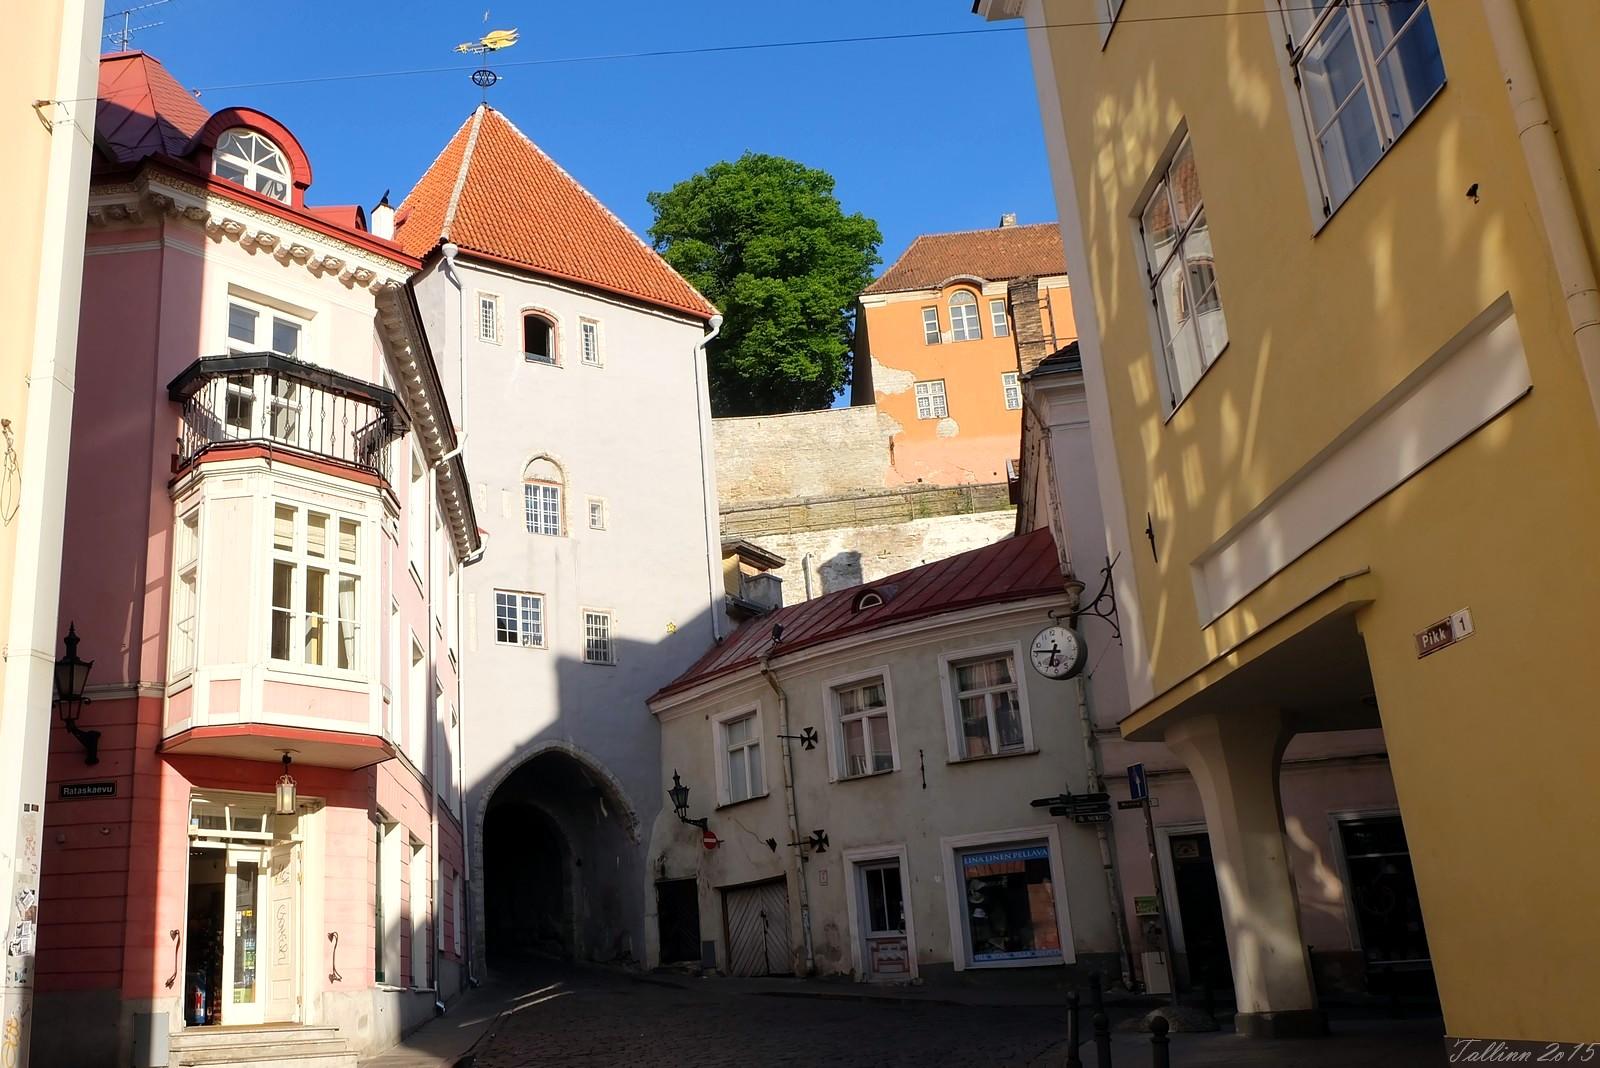 Gates, Tallinn, Estonia